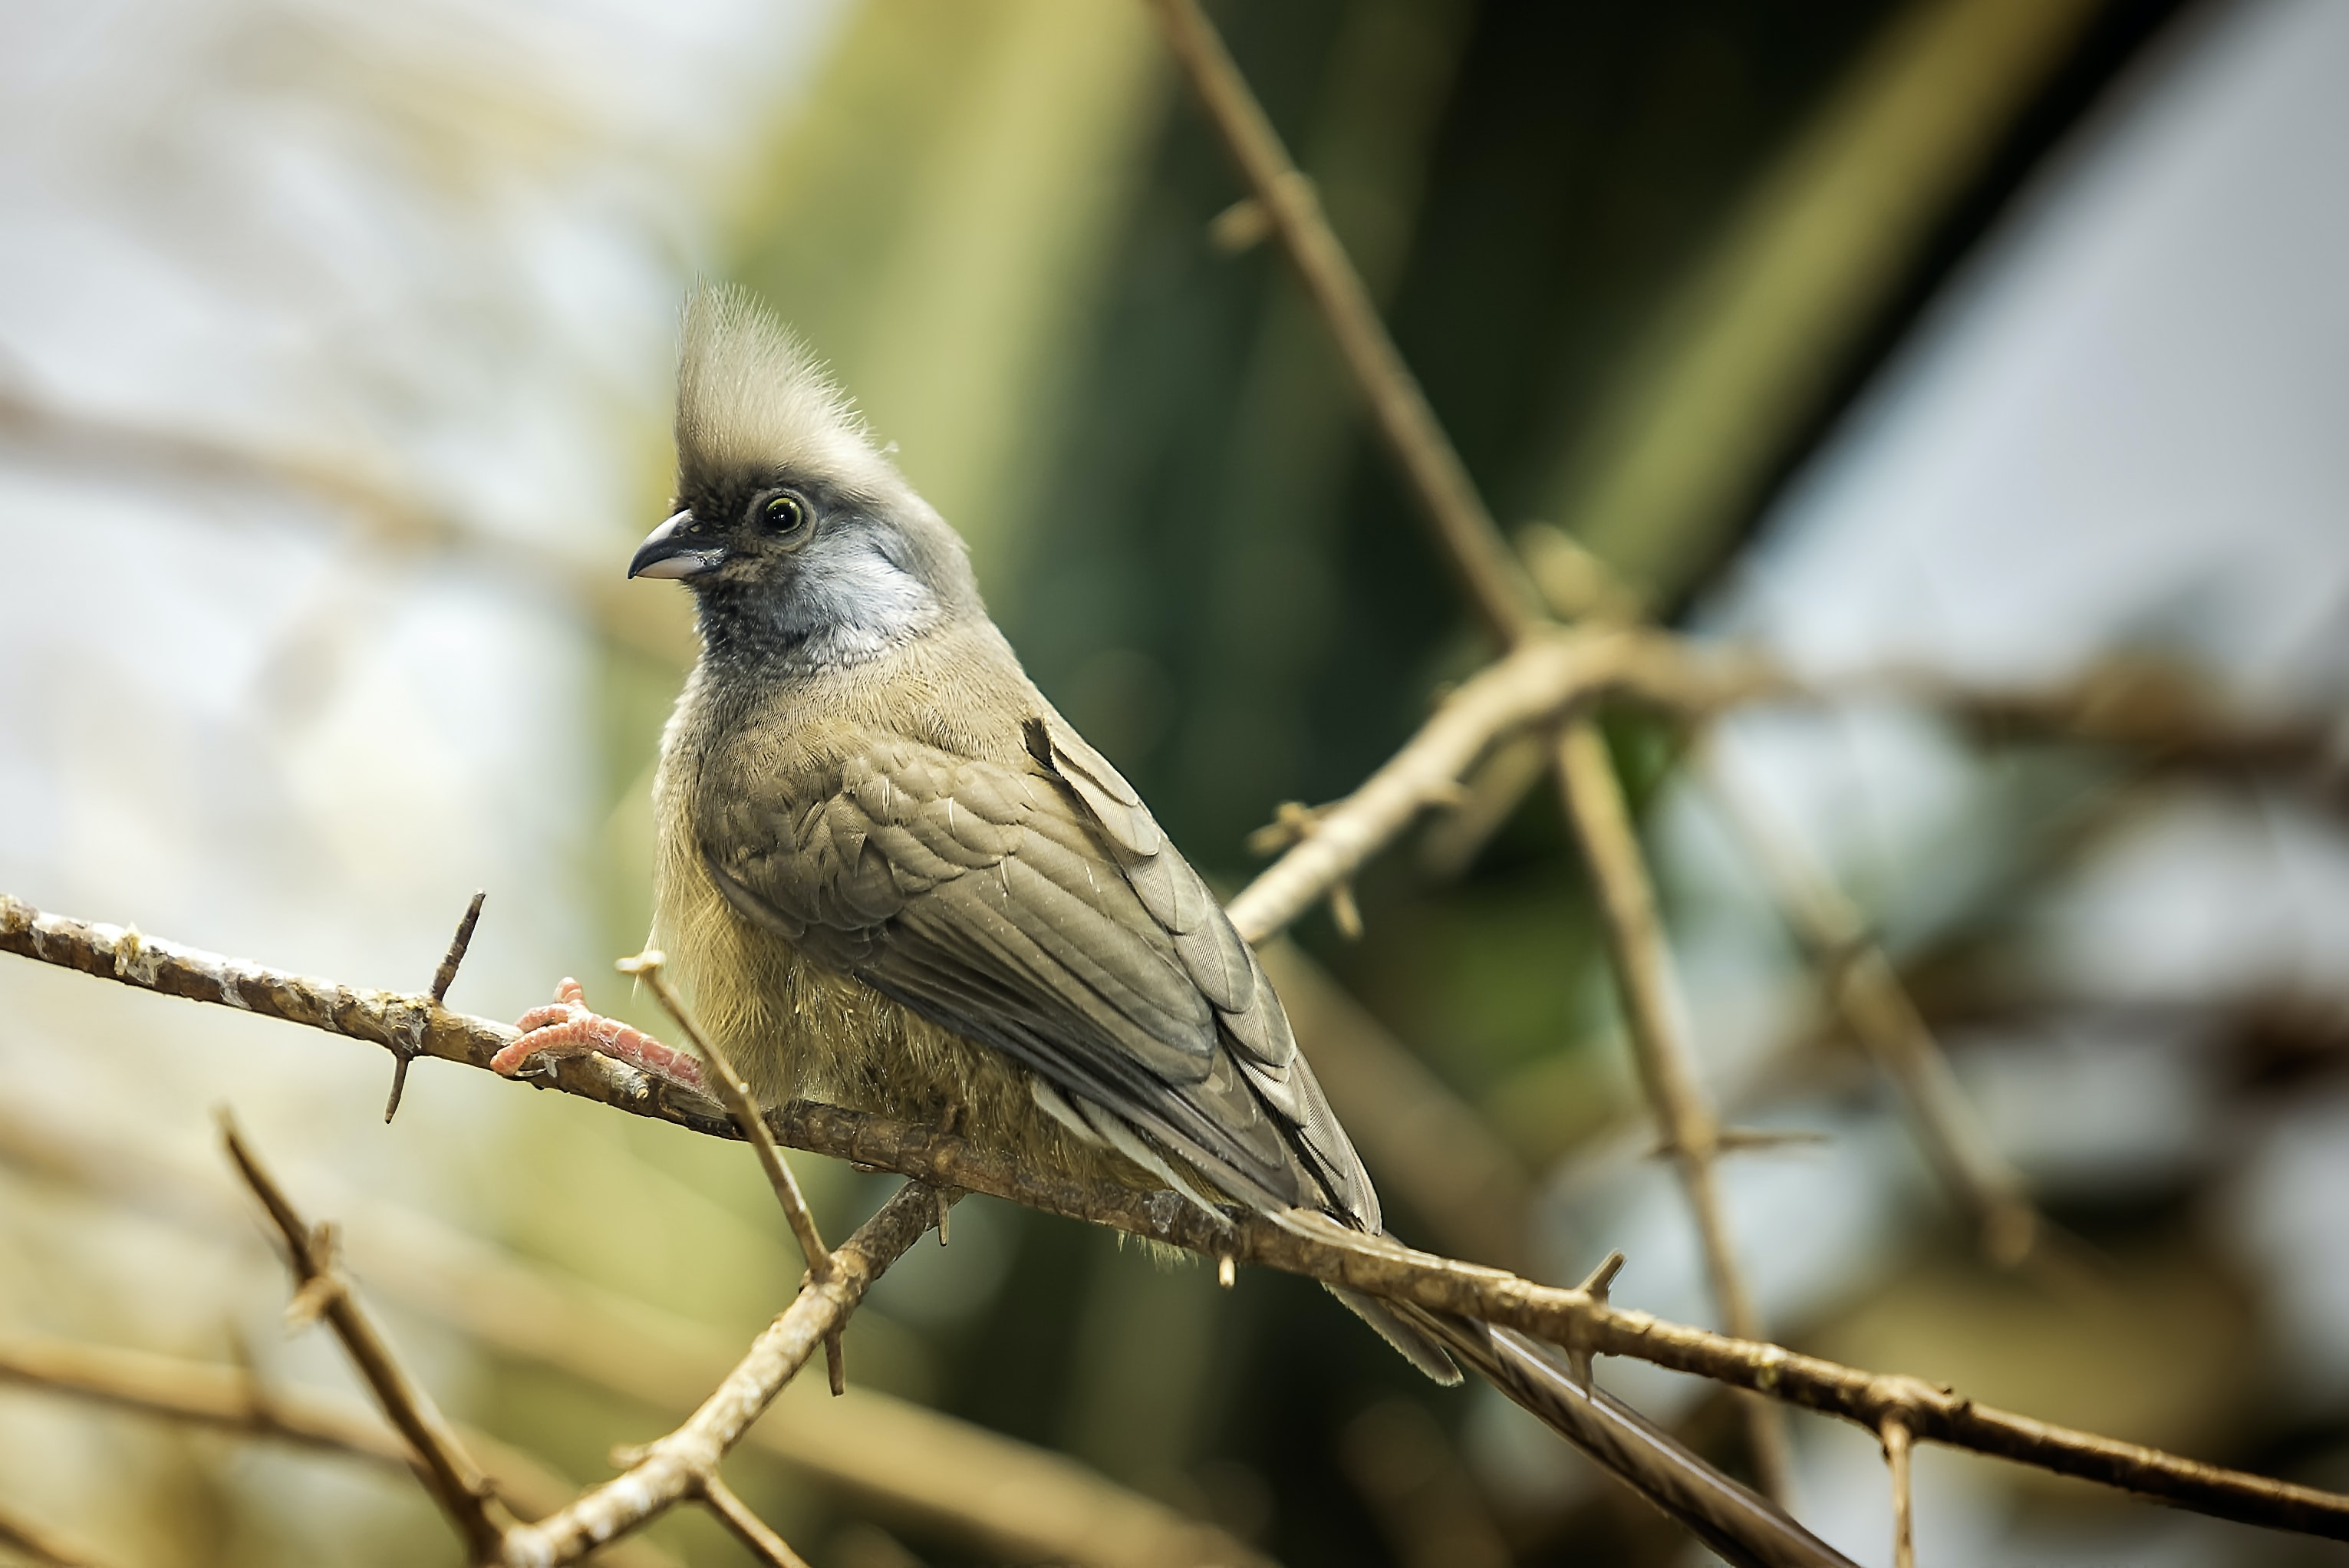 brown bird on brown stem